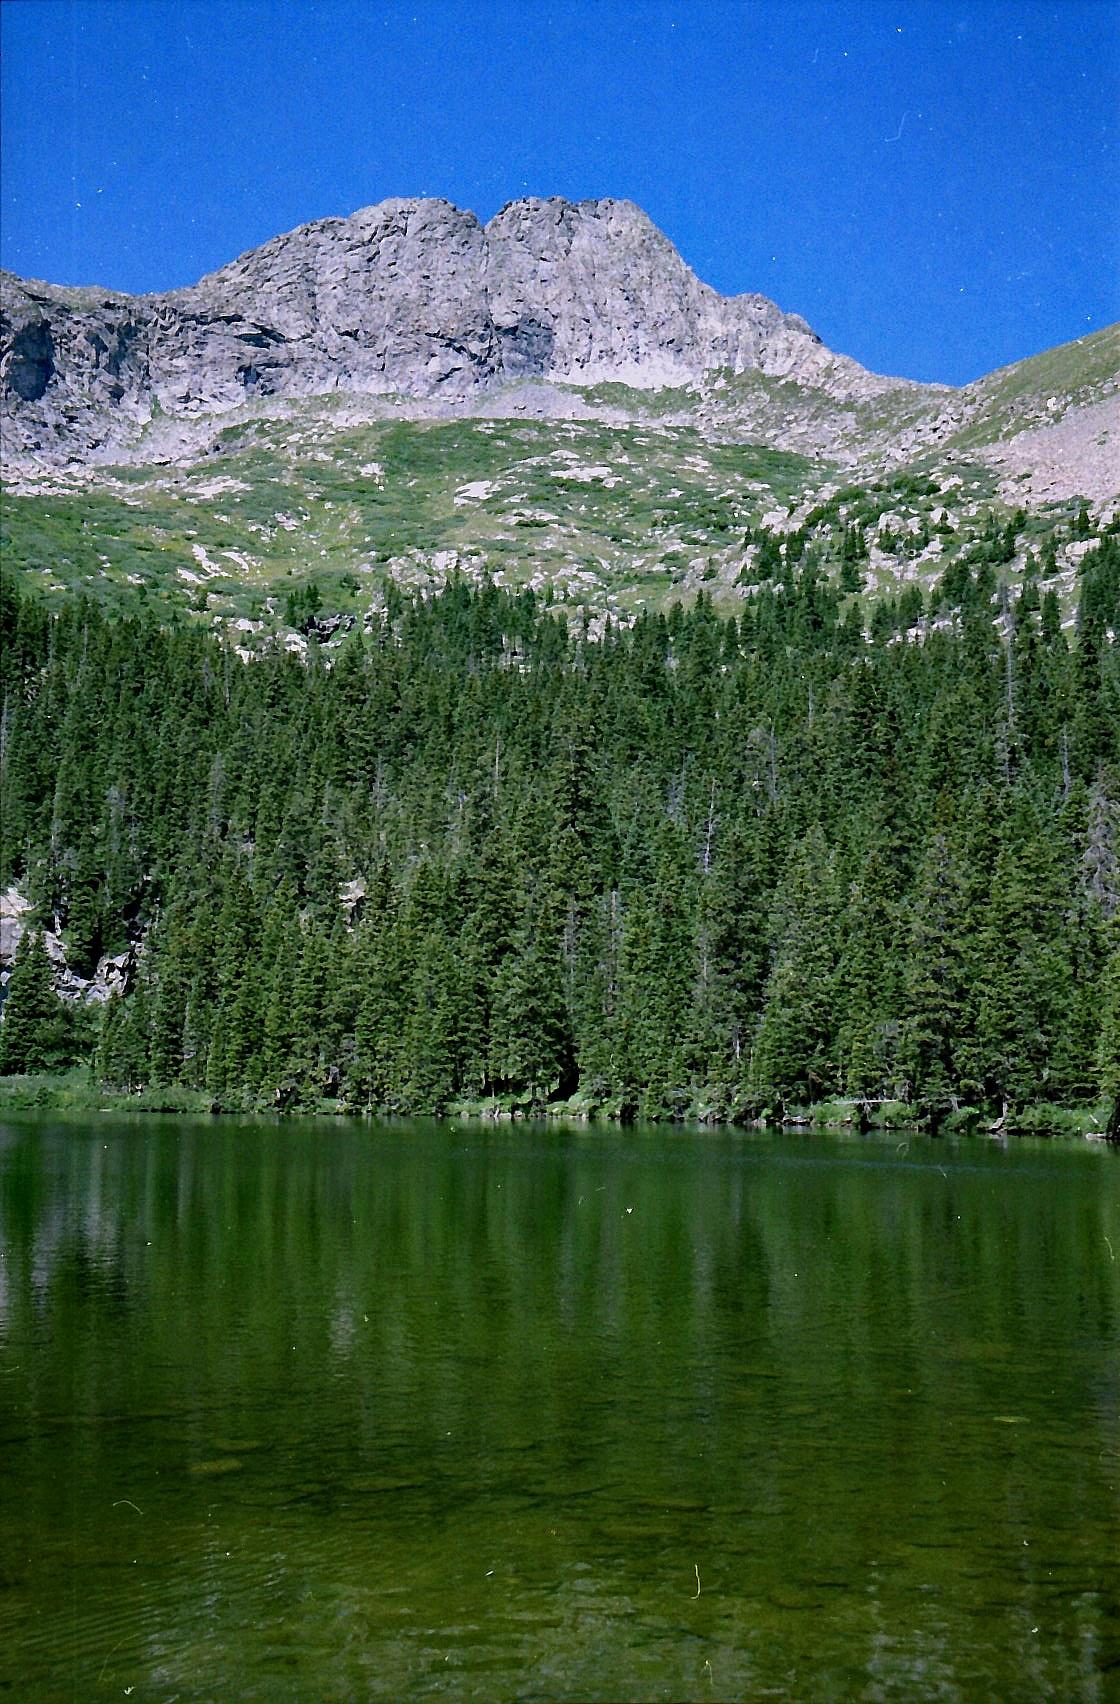 Music Mountain - 13,380